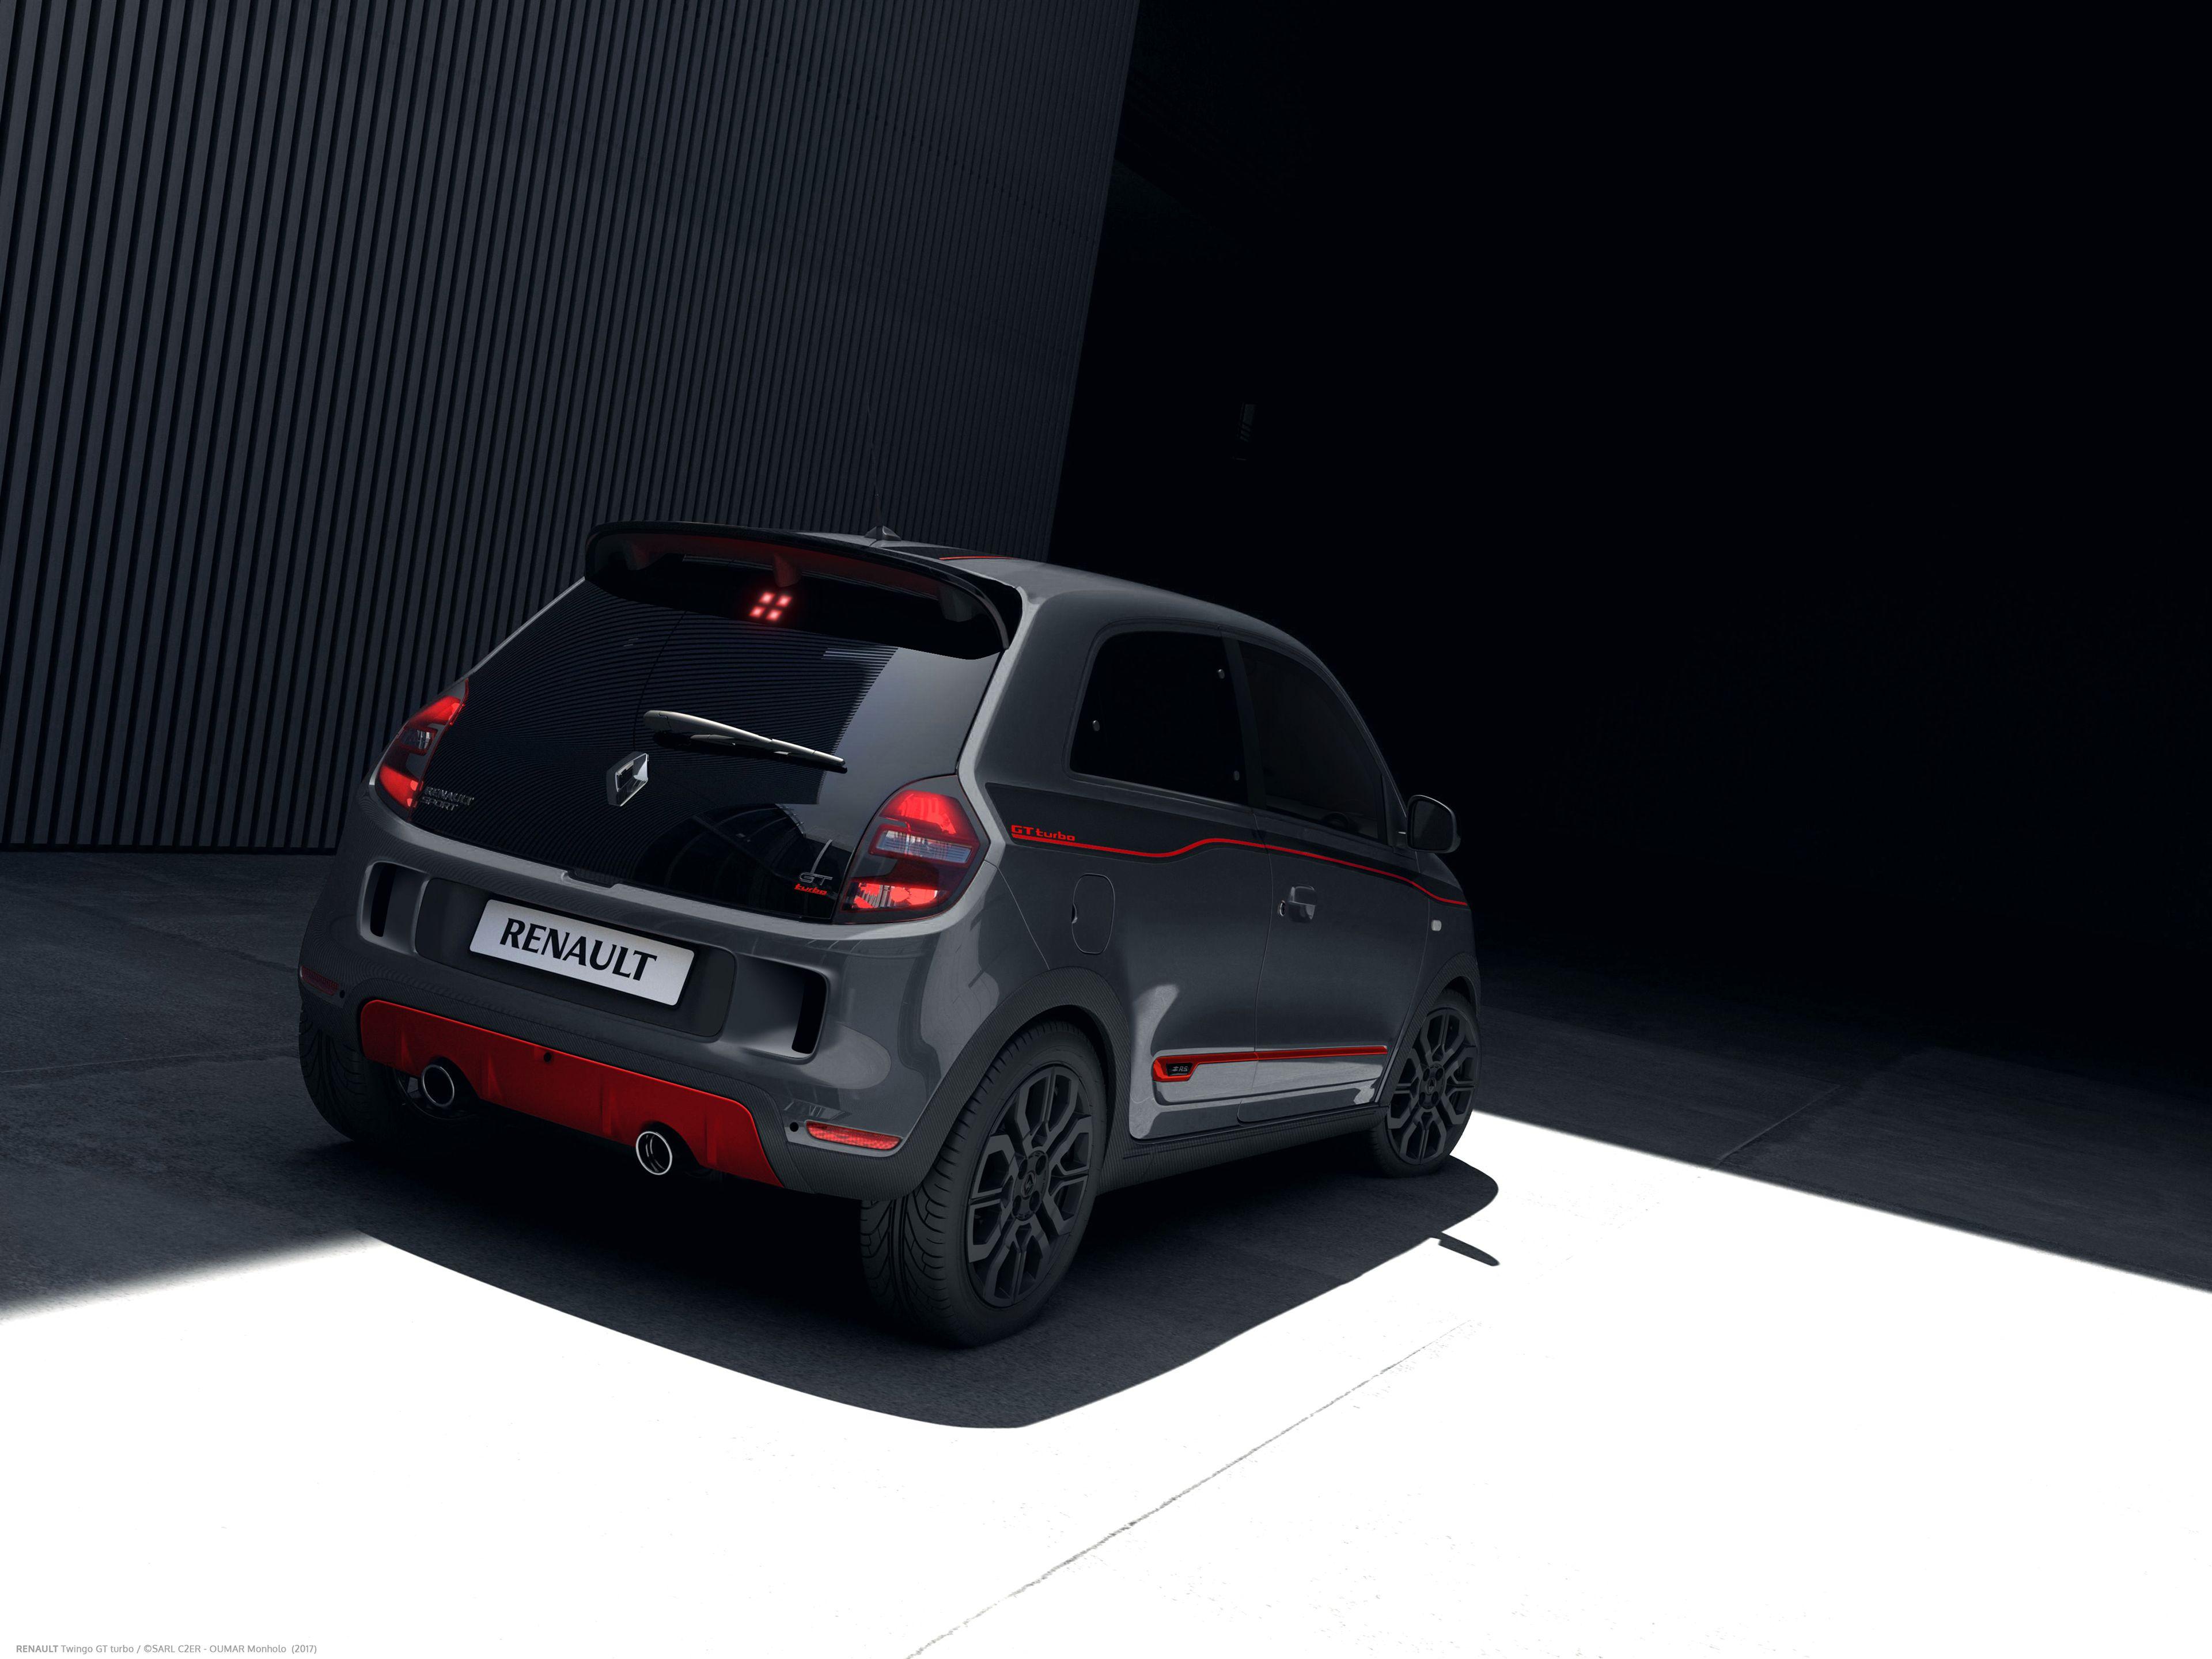 Renault Twingo Gt Turbo ルノー トゥインゴ トゥインゴ ルノー